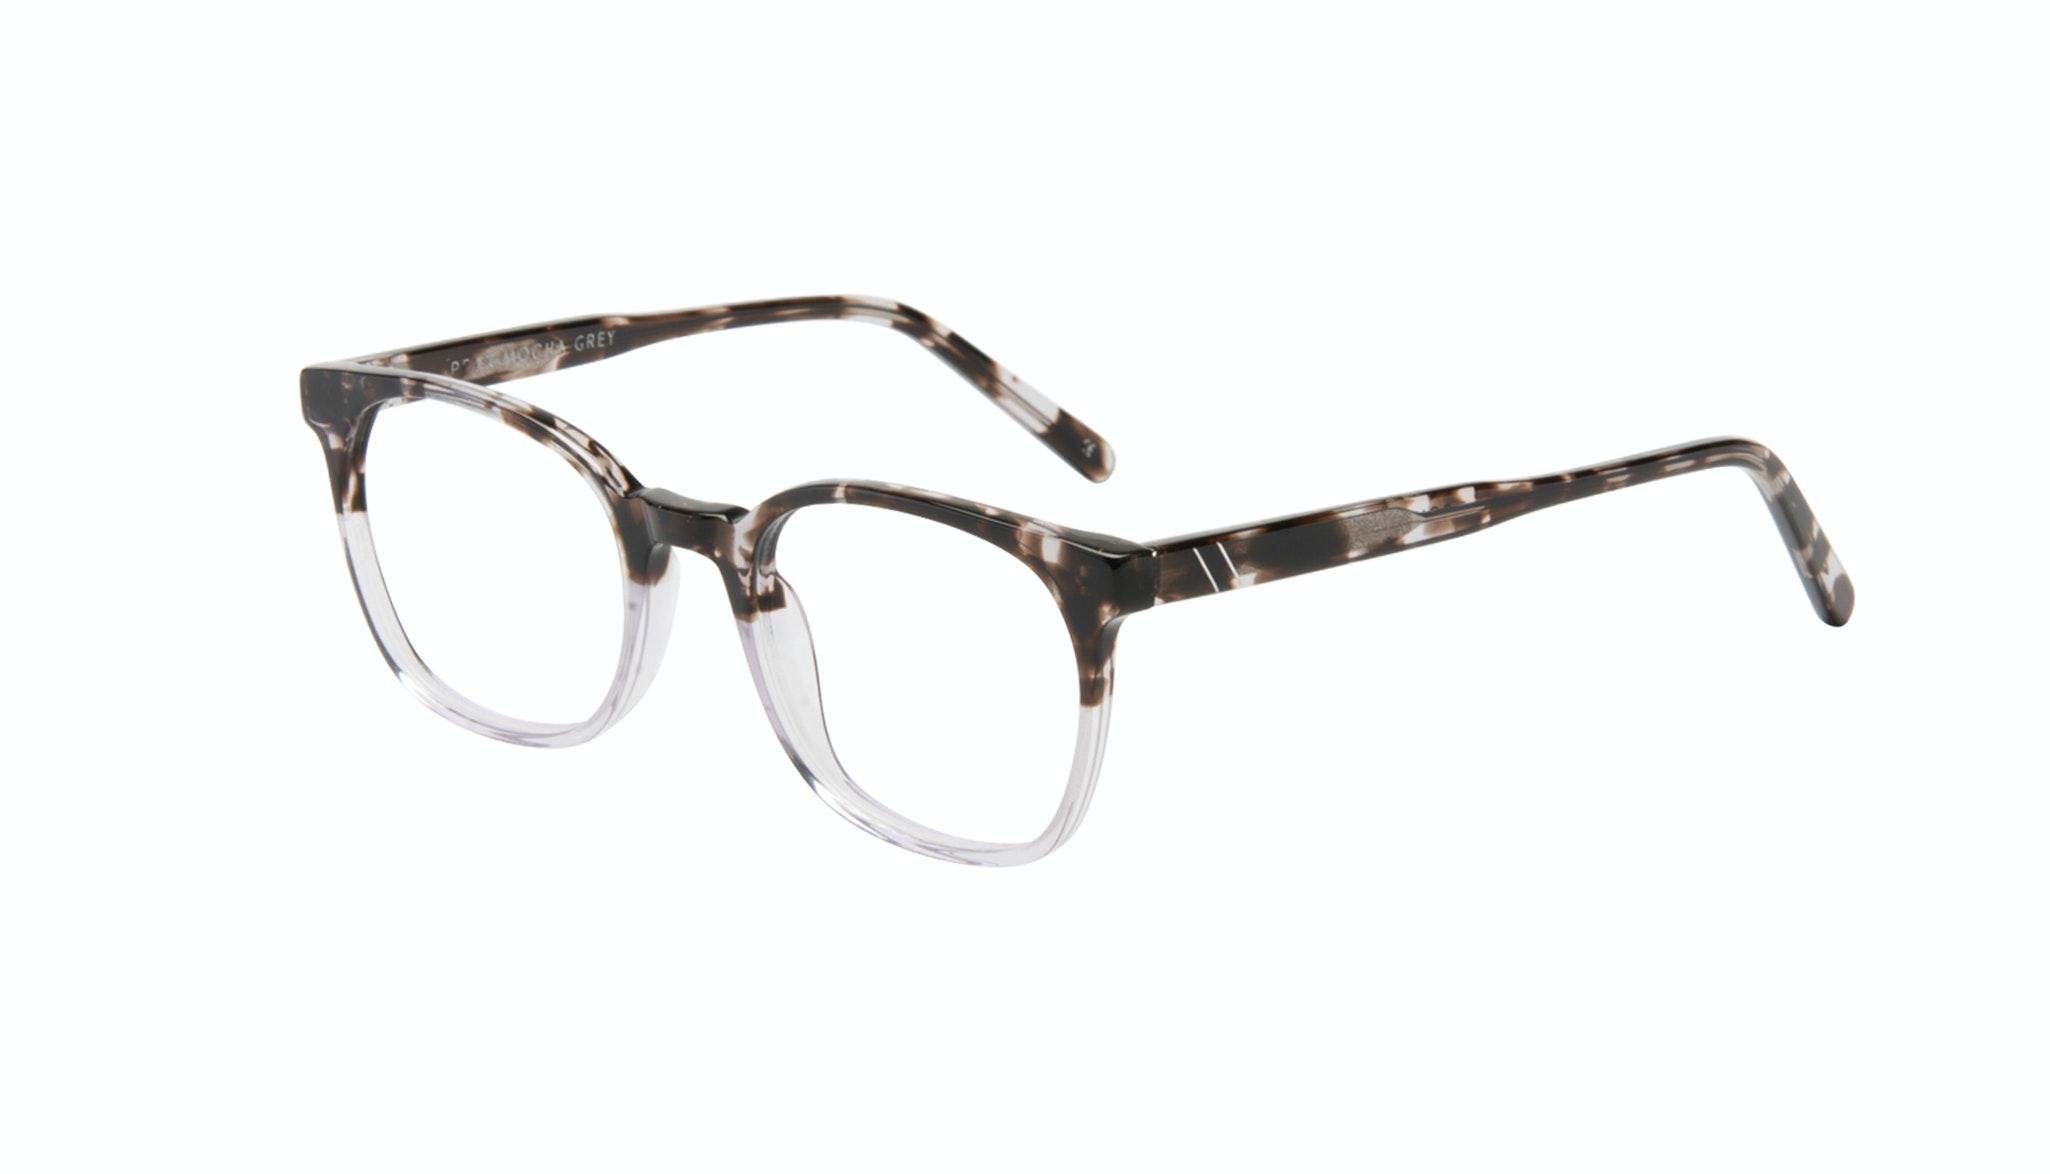 Affordable Fashion Glasses Rectangle Square Eyeglasses Men Peak Mocha Grey Tilt